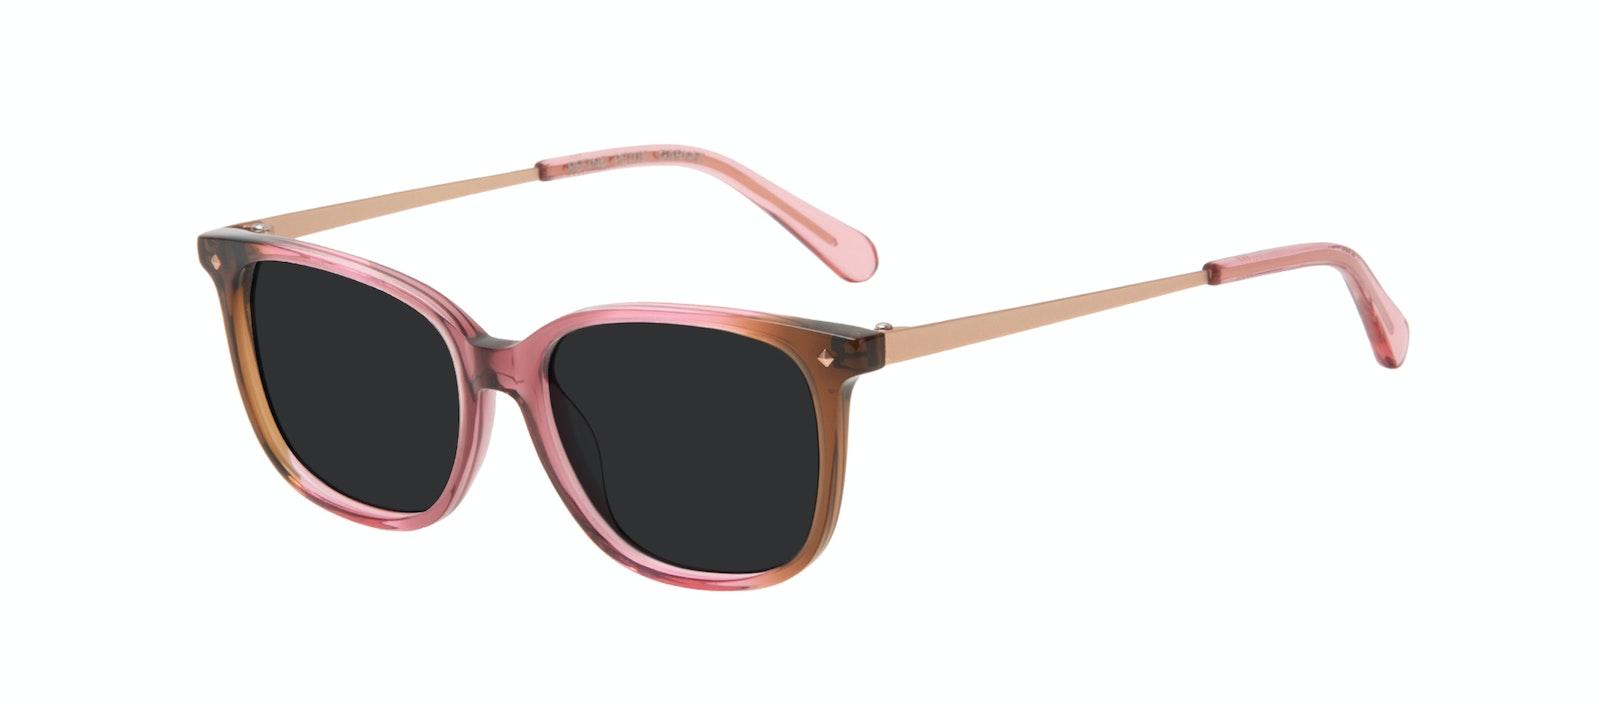 Affordable Fashion Glasses Square Sunglasses Women Refine Petite Garnet Tilt